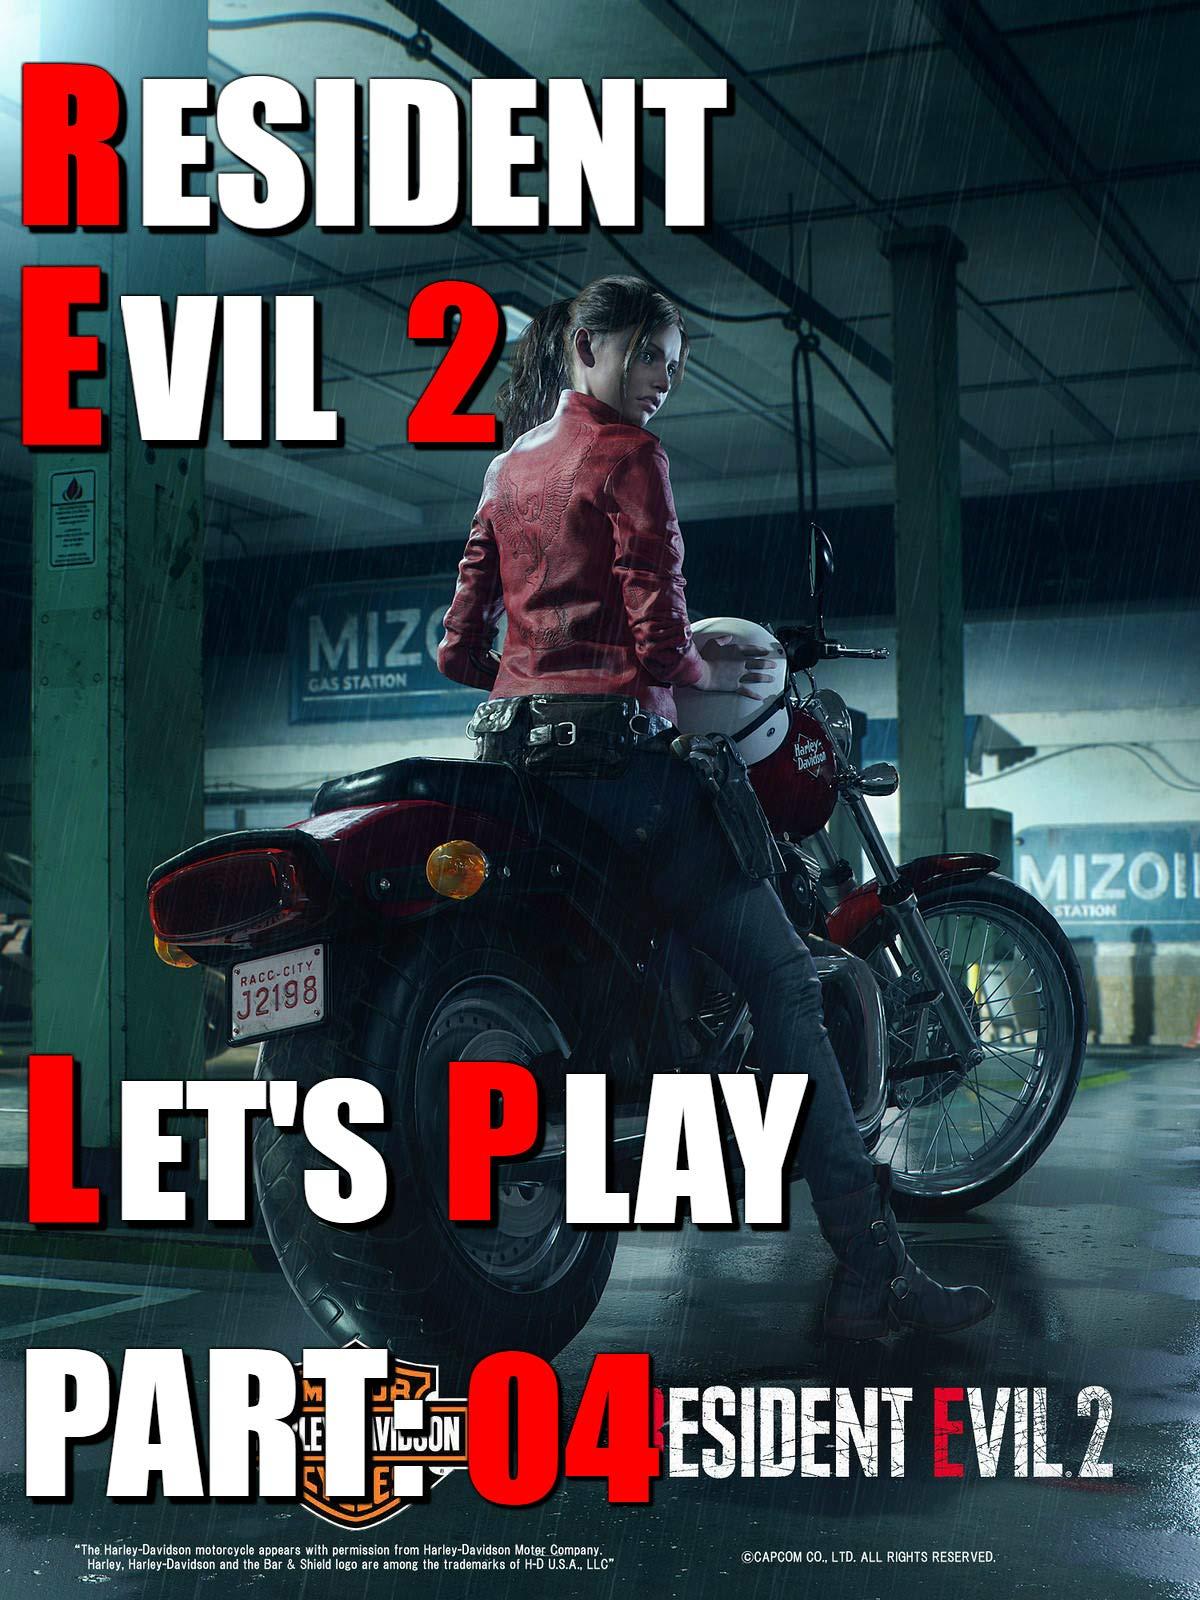 Resident Evil 2 | Let's Play | Part 4.